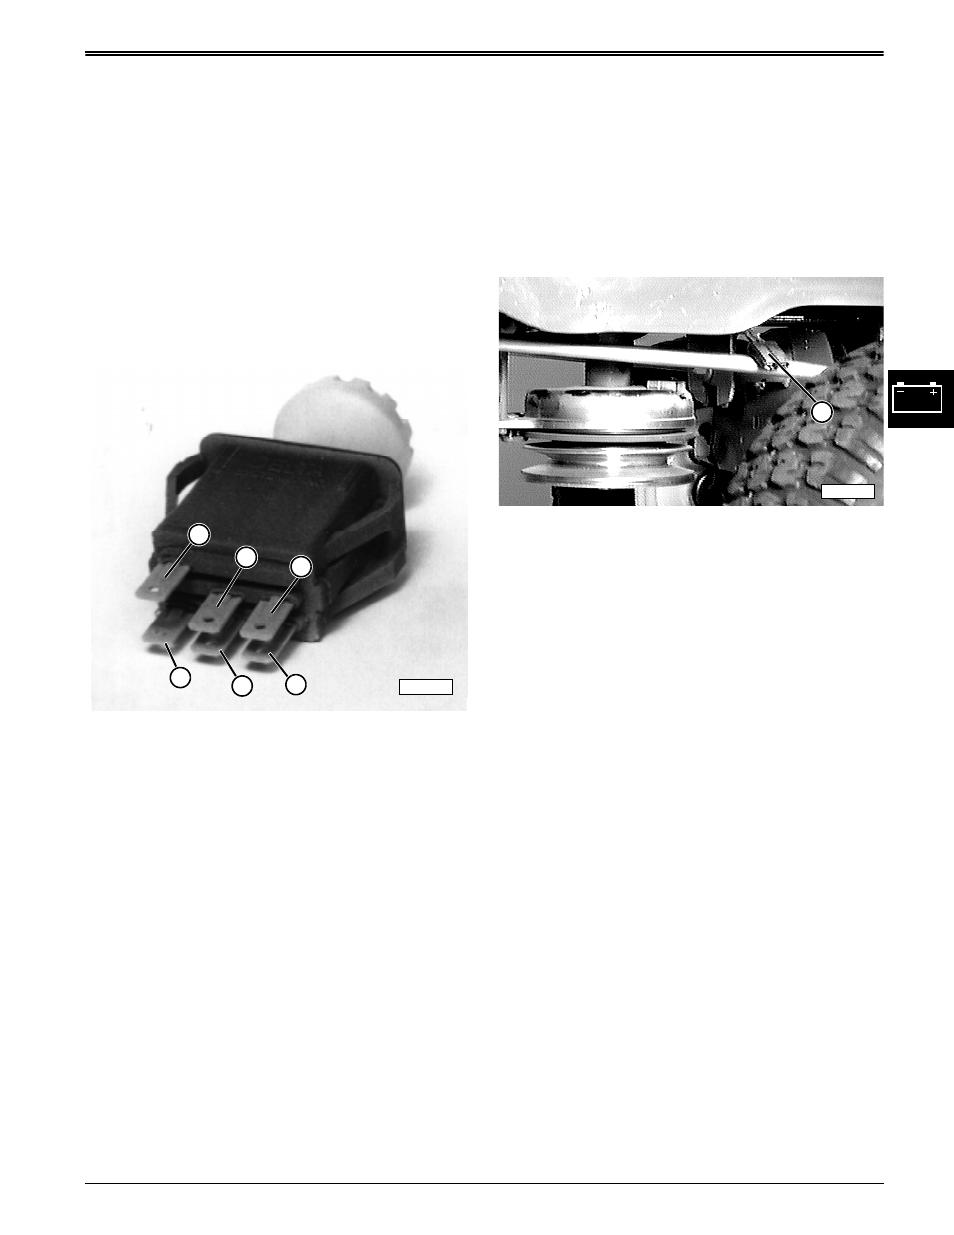 john deere stx38 page155?resize=665%2C861 sophisticated john deere stx30 wiring diagram photos wiring john deere stx30 wiring diagram at soozxer.org